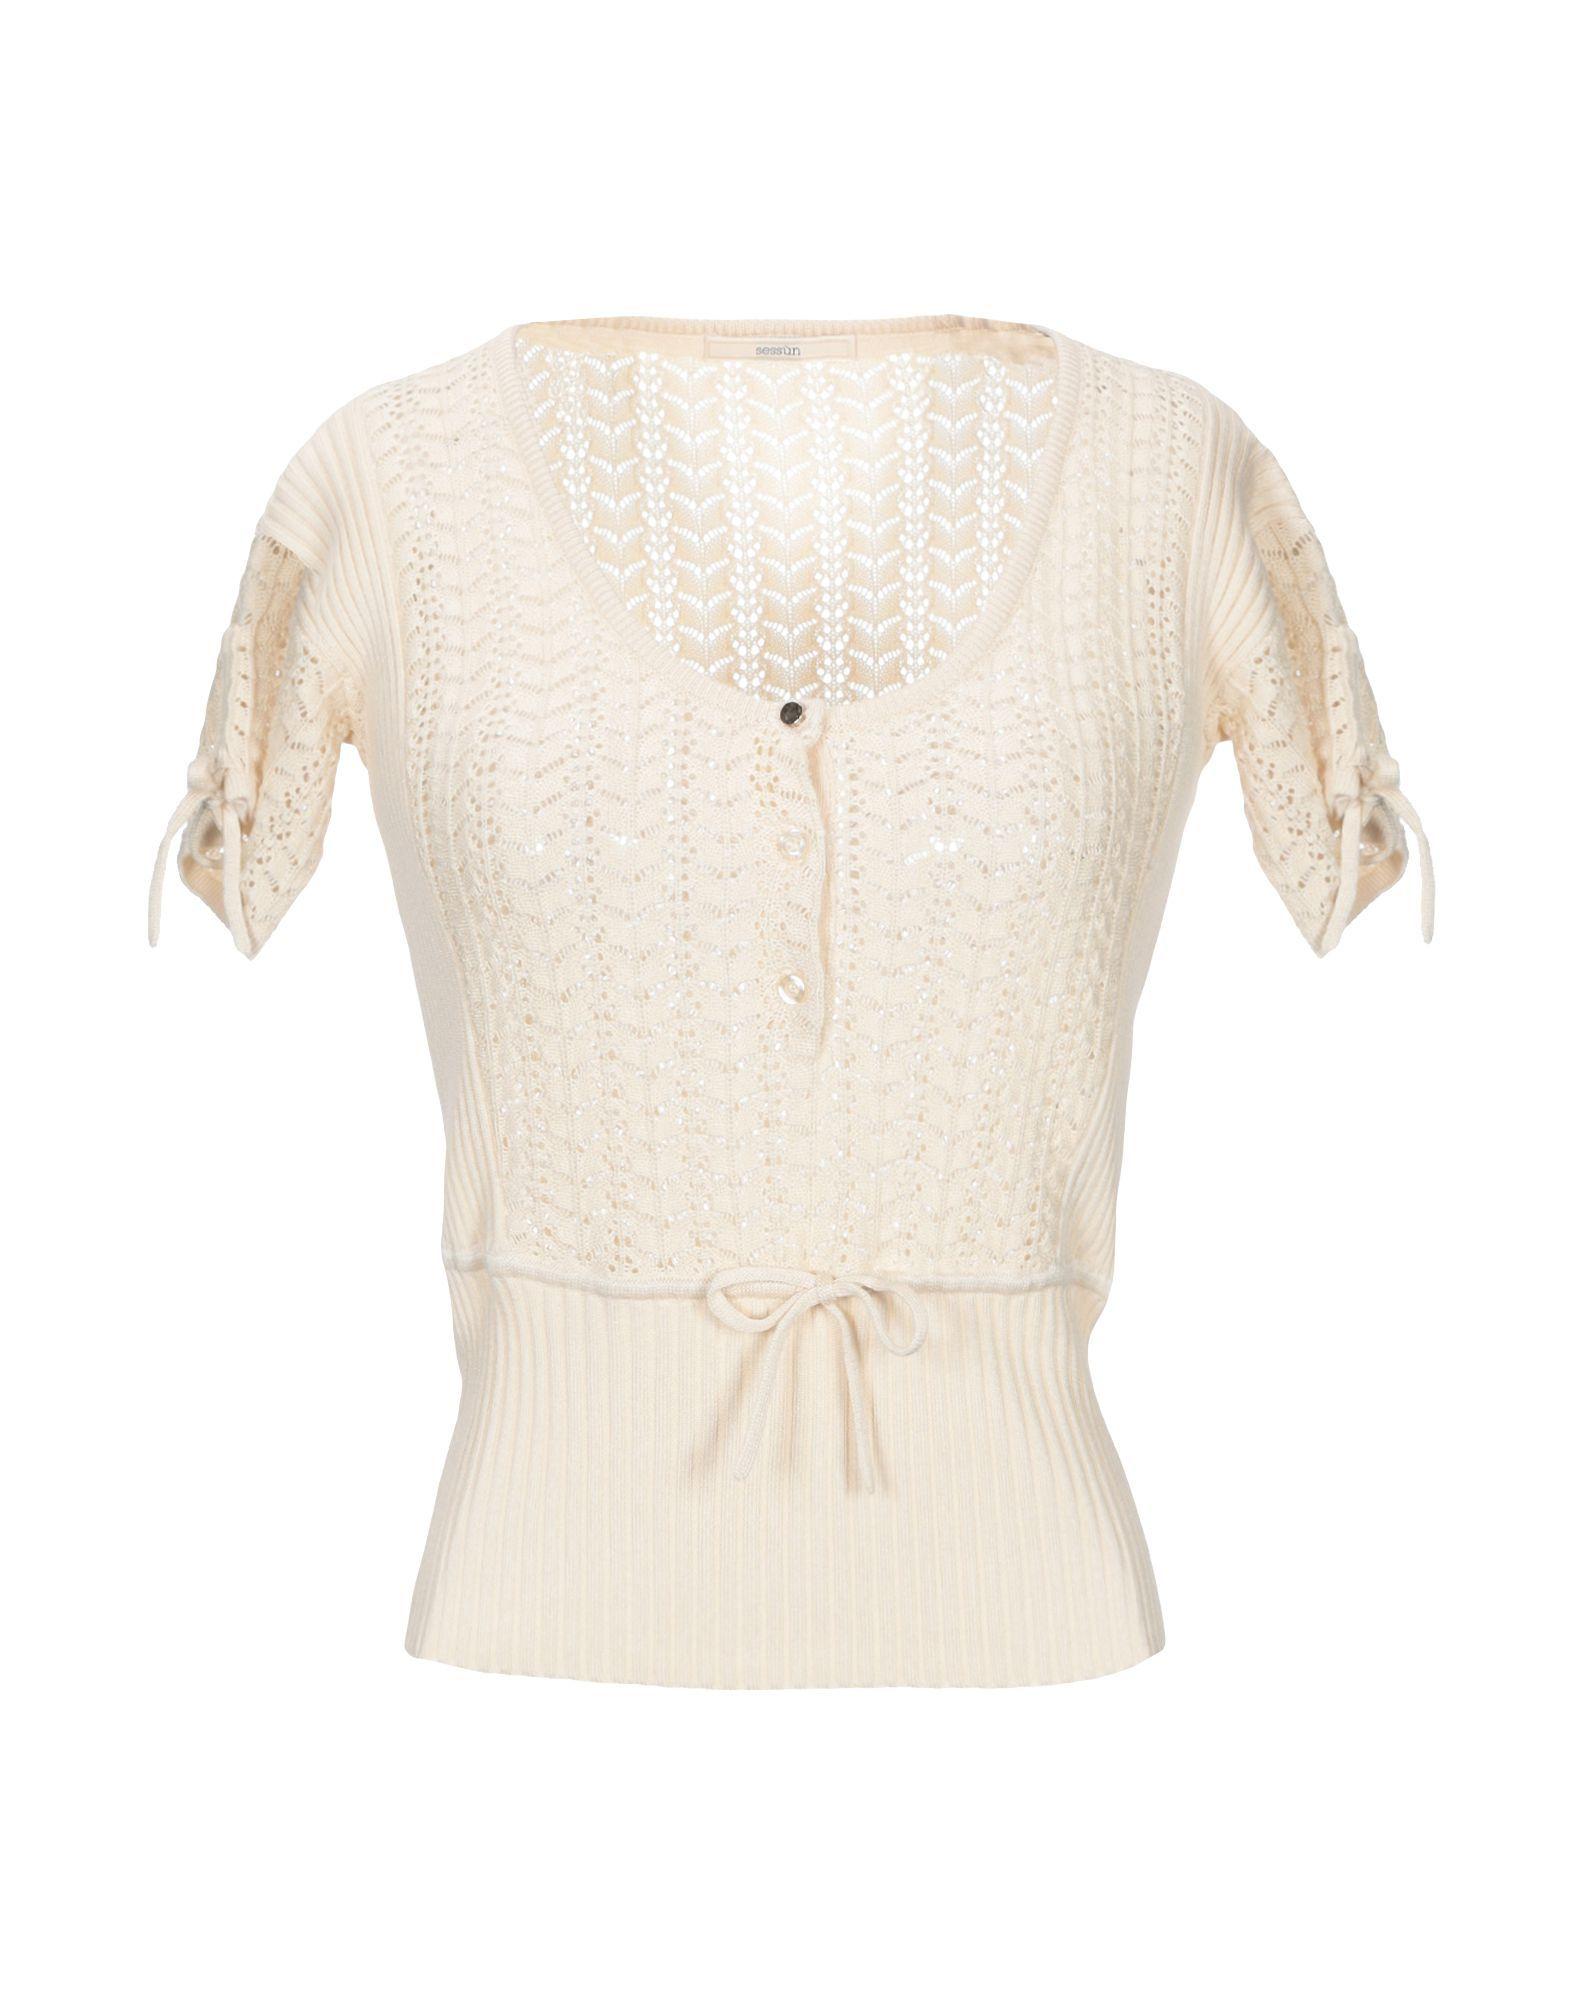 Sessun Beige Short Sleeve Knit